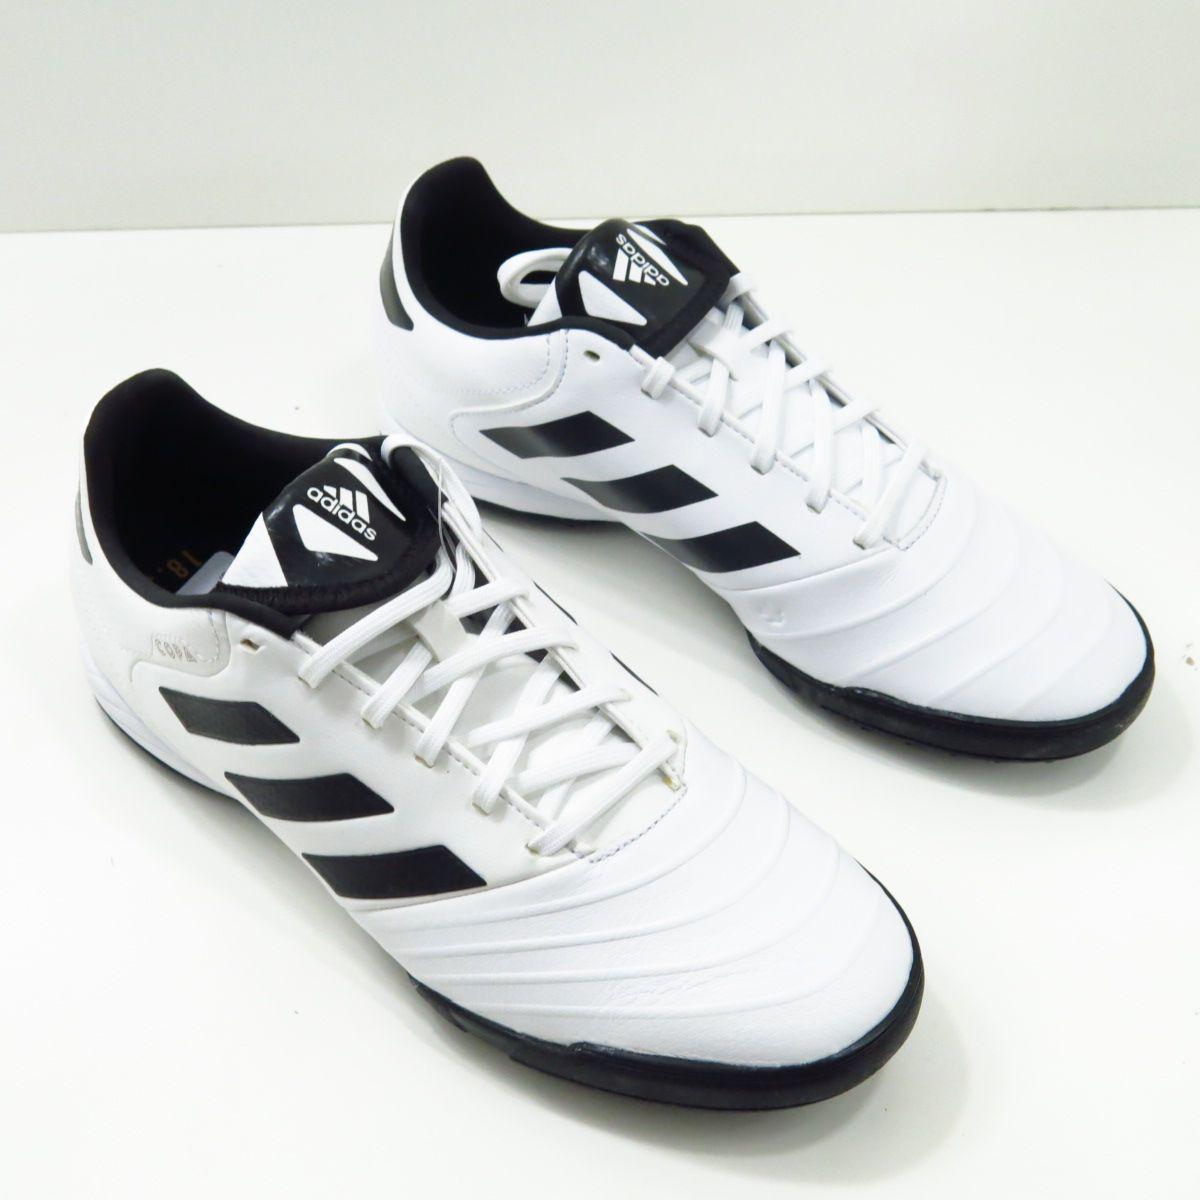 Chuteira Adidas Copa 18.3 TF Society - Couro